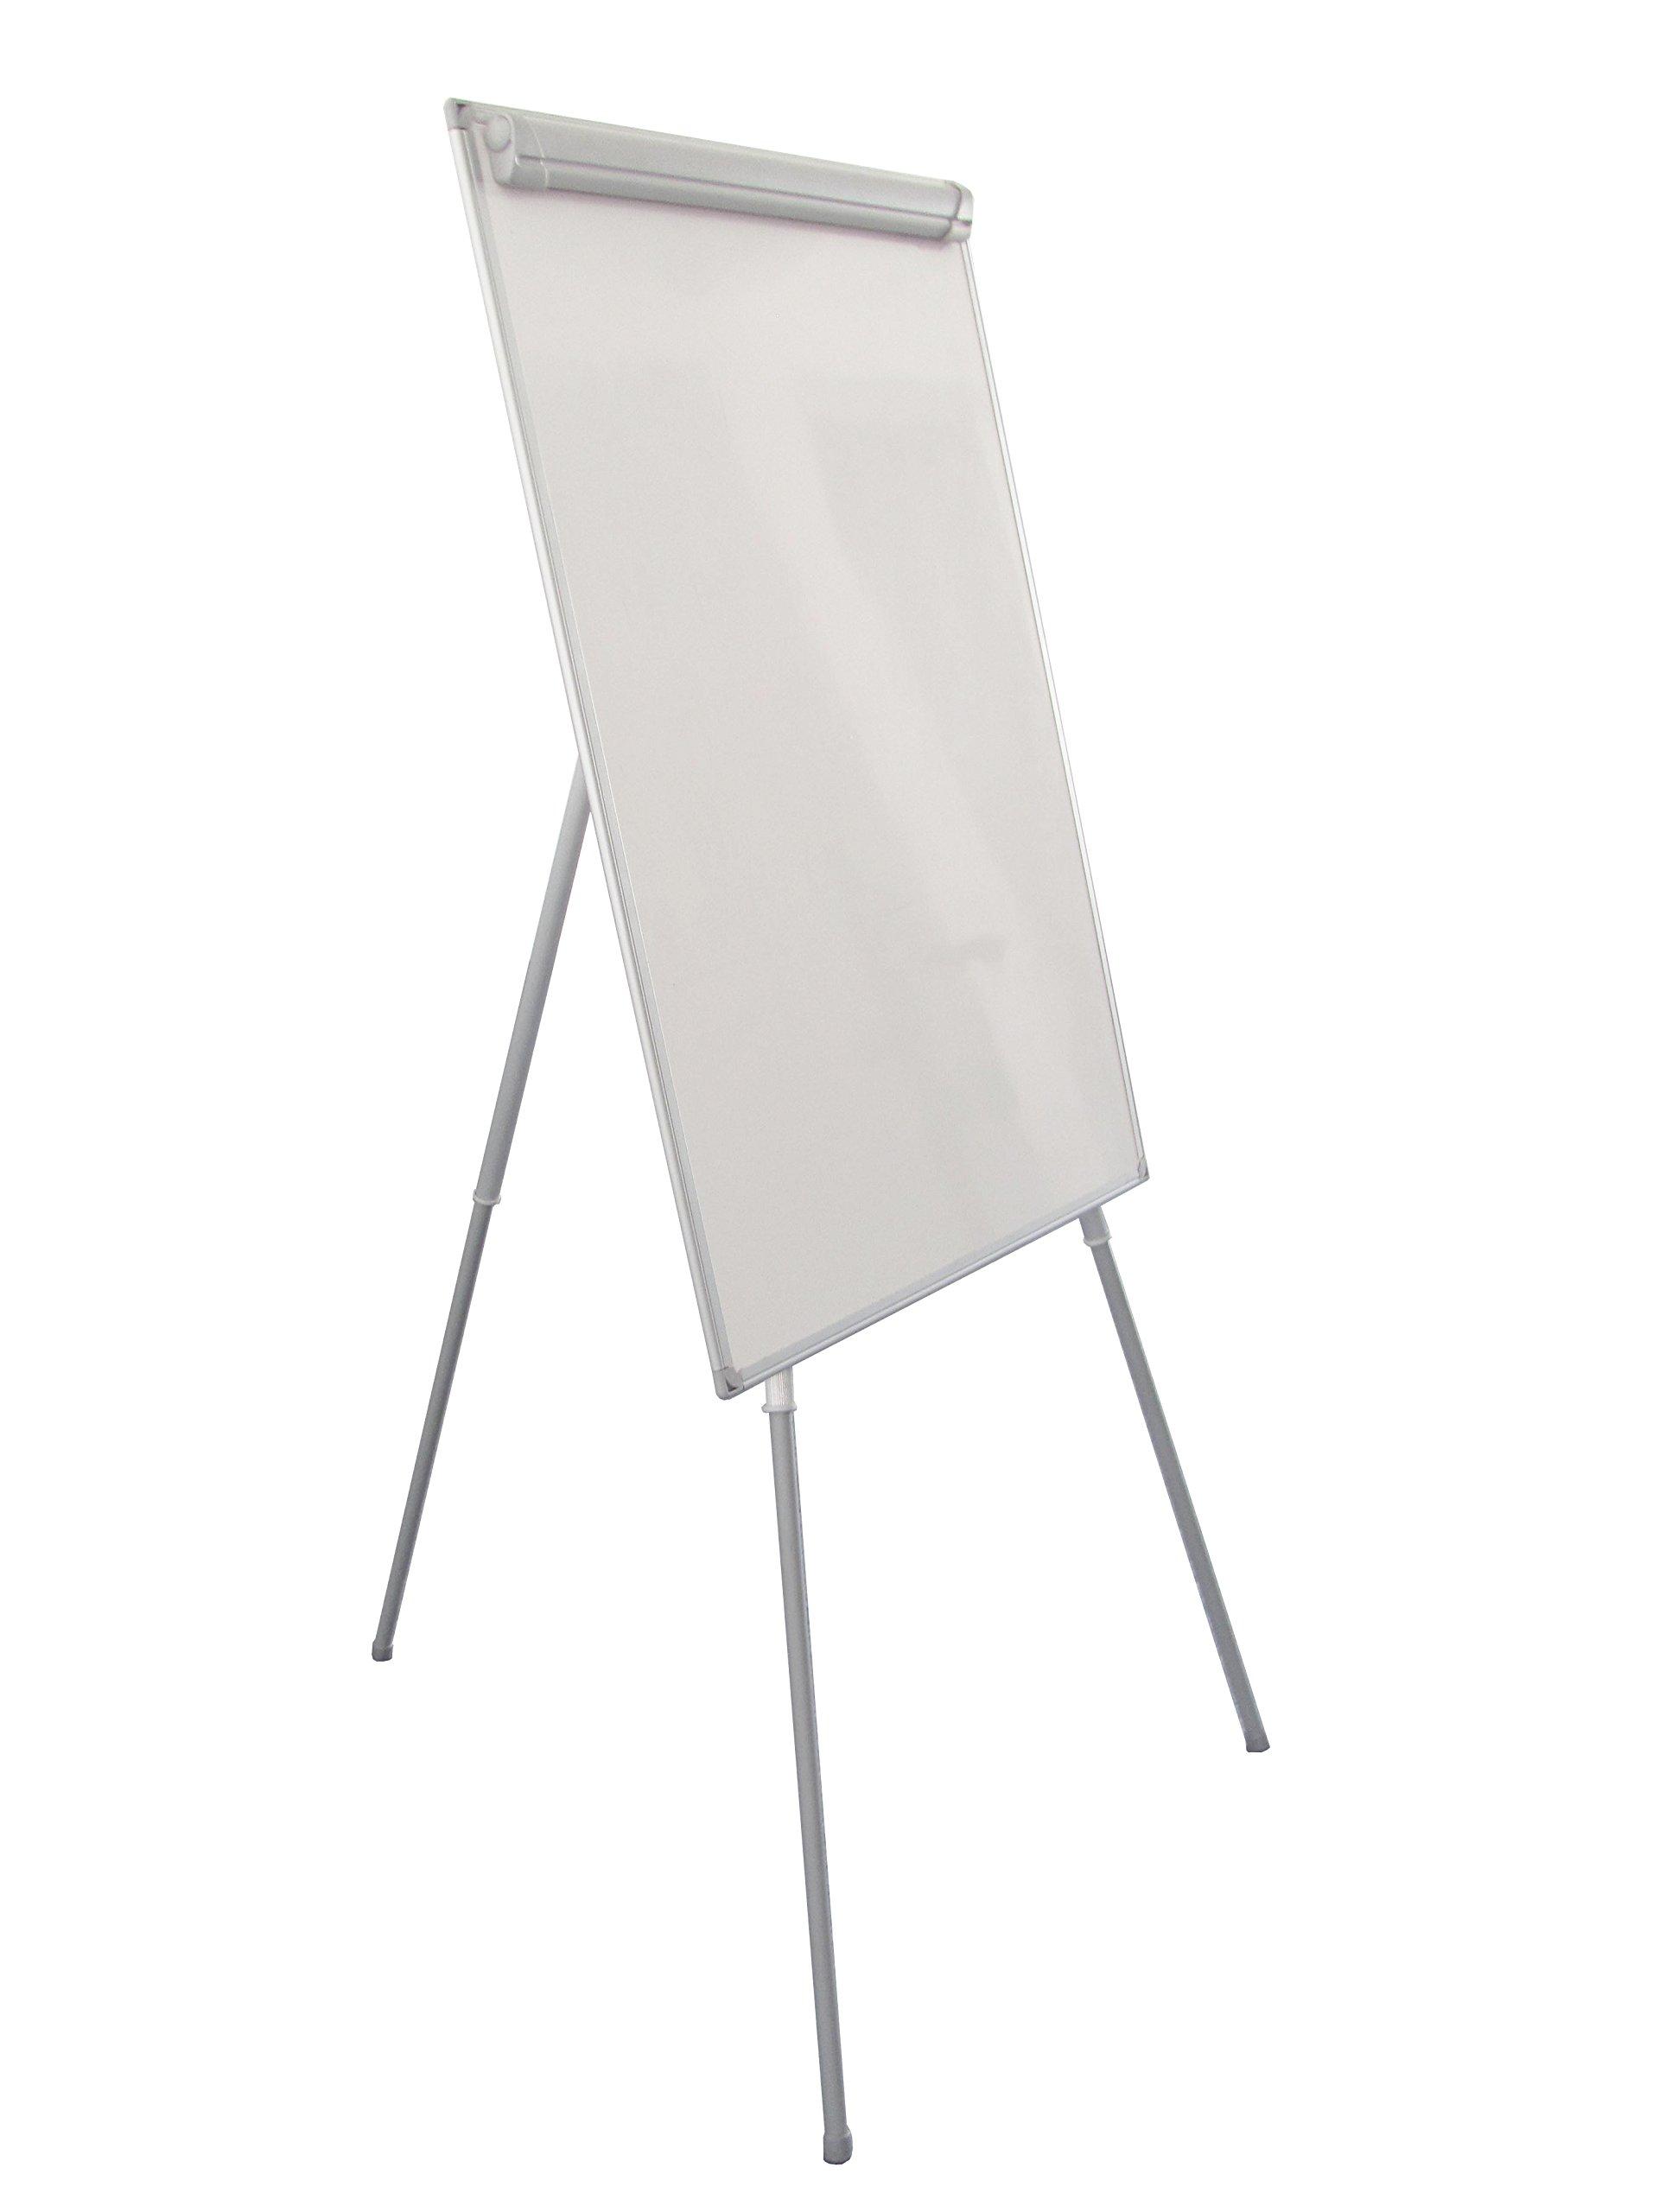 Magnetic Presentation Easel Board,Flipchart, Magnetic Dry-Erase Board,Aluminum Frame, 42''H x 29-1/2''W